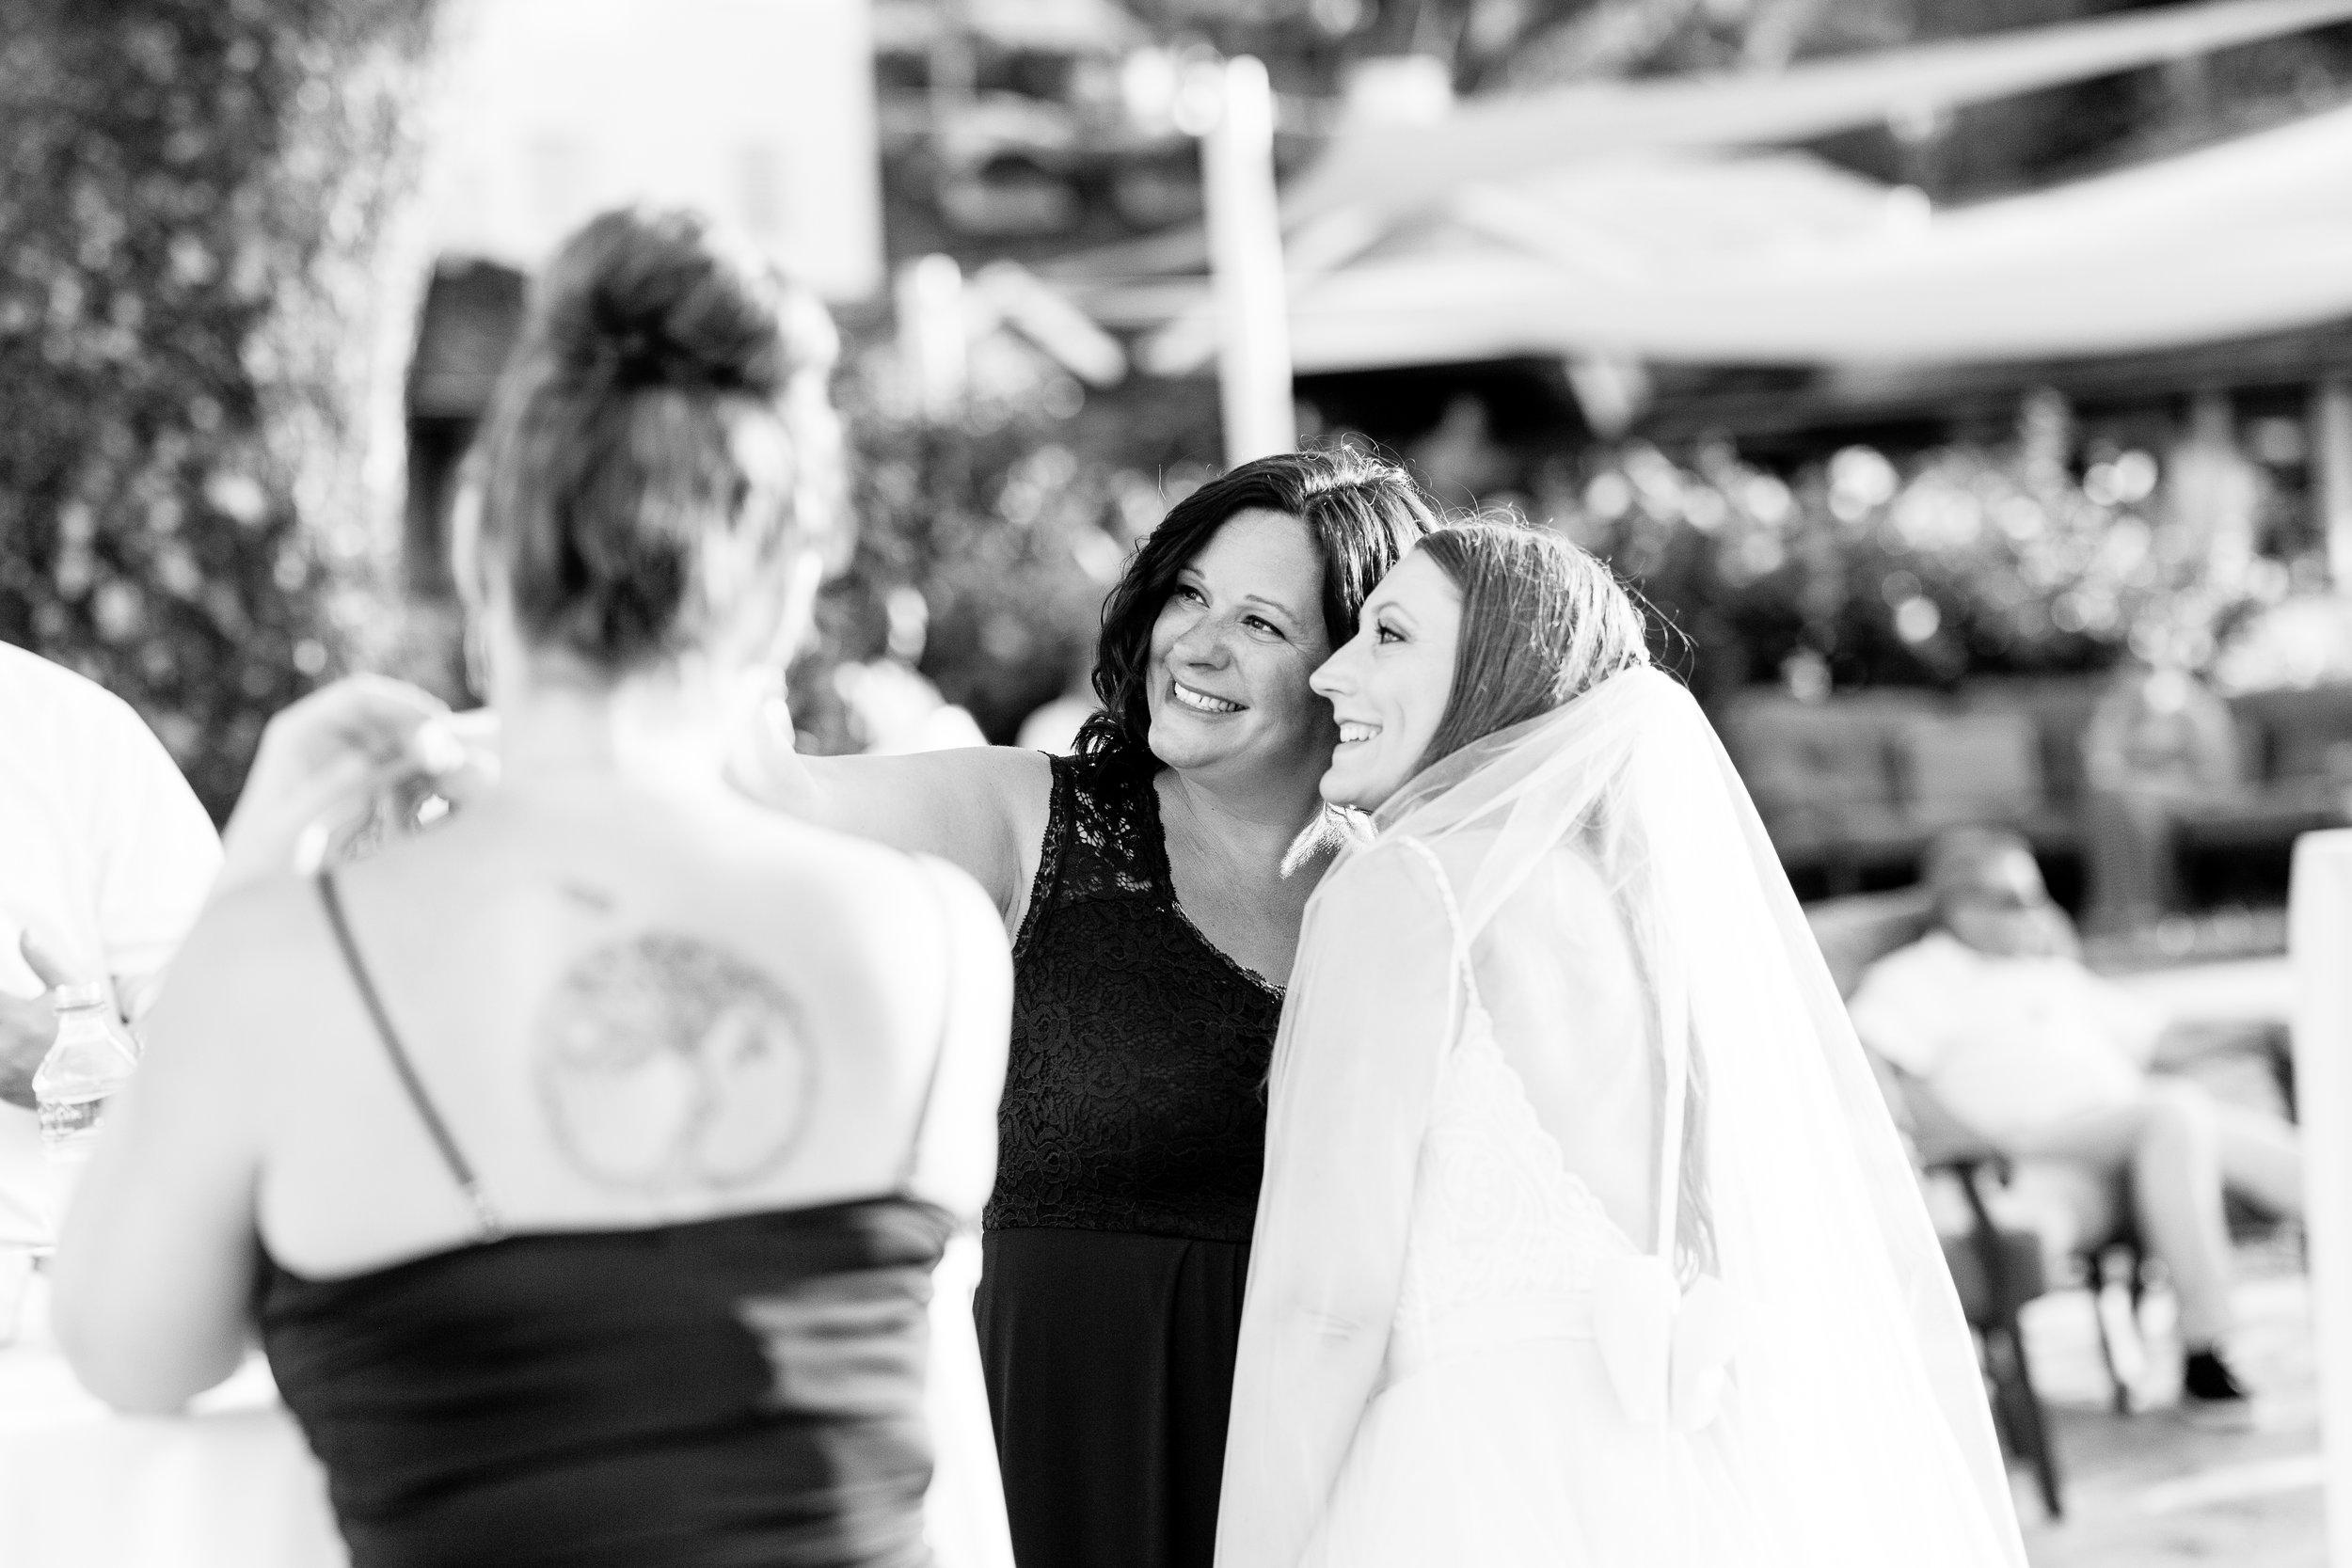 nicole-daacke-photography-destination-wedding-in-st-lucia-sandals-la-toc-intimate-island-wedding-carribean-elopement-photographer-chill-island-wedding-109.jpg